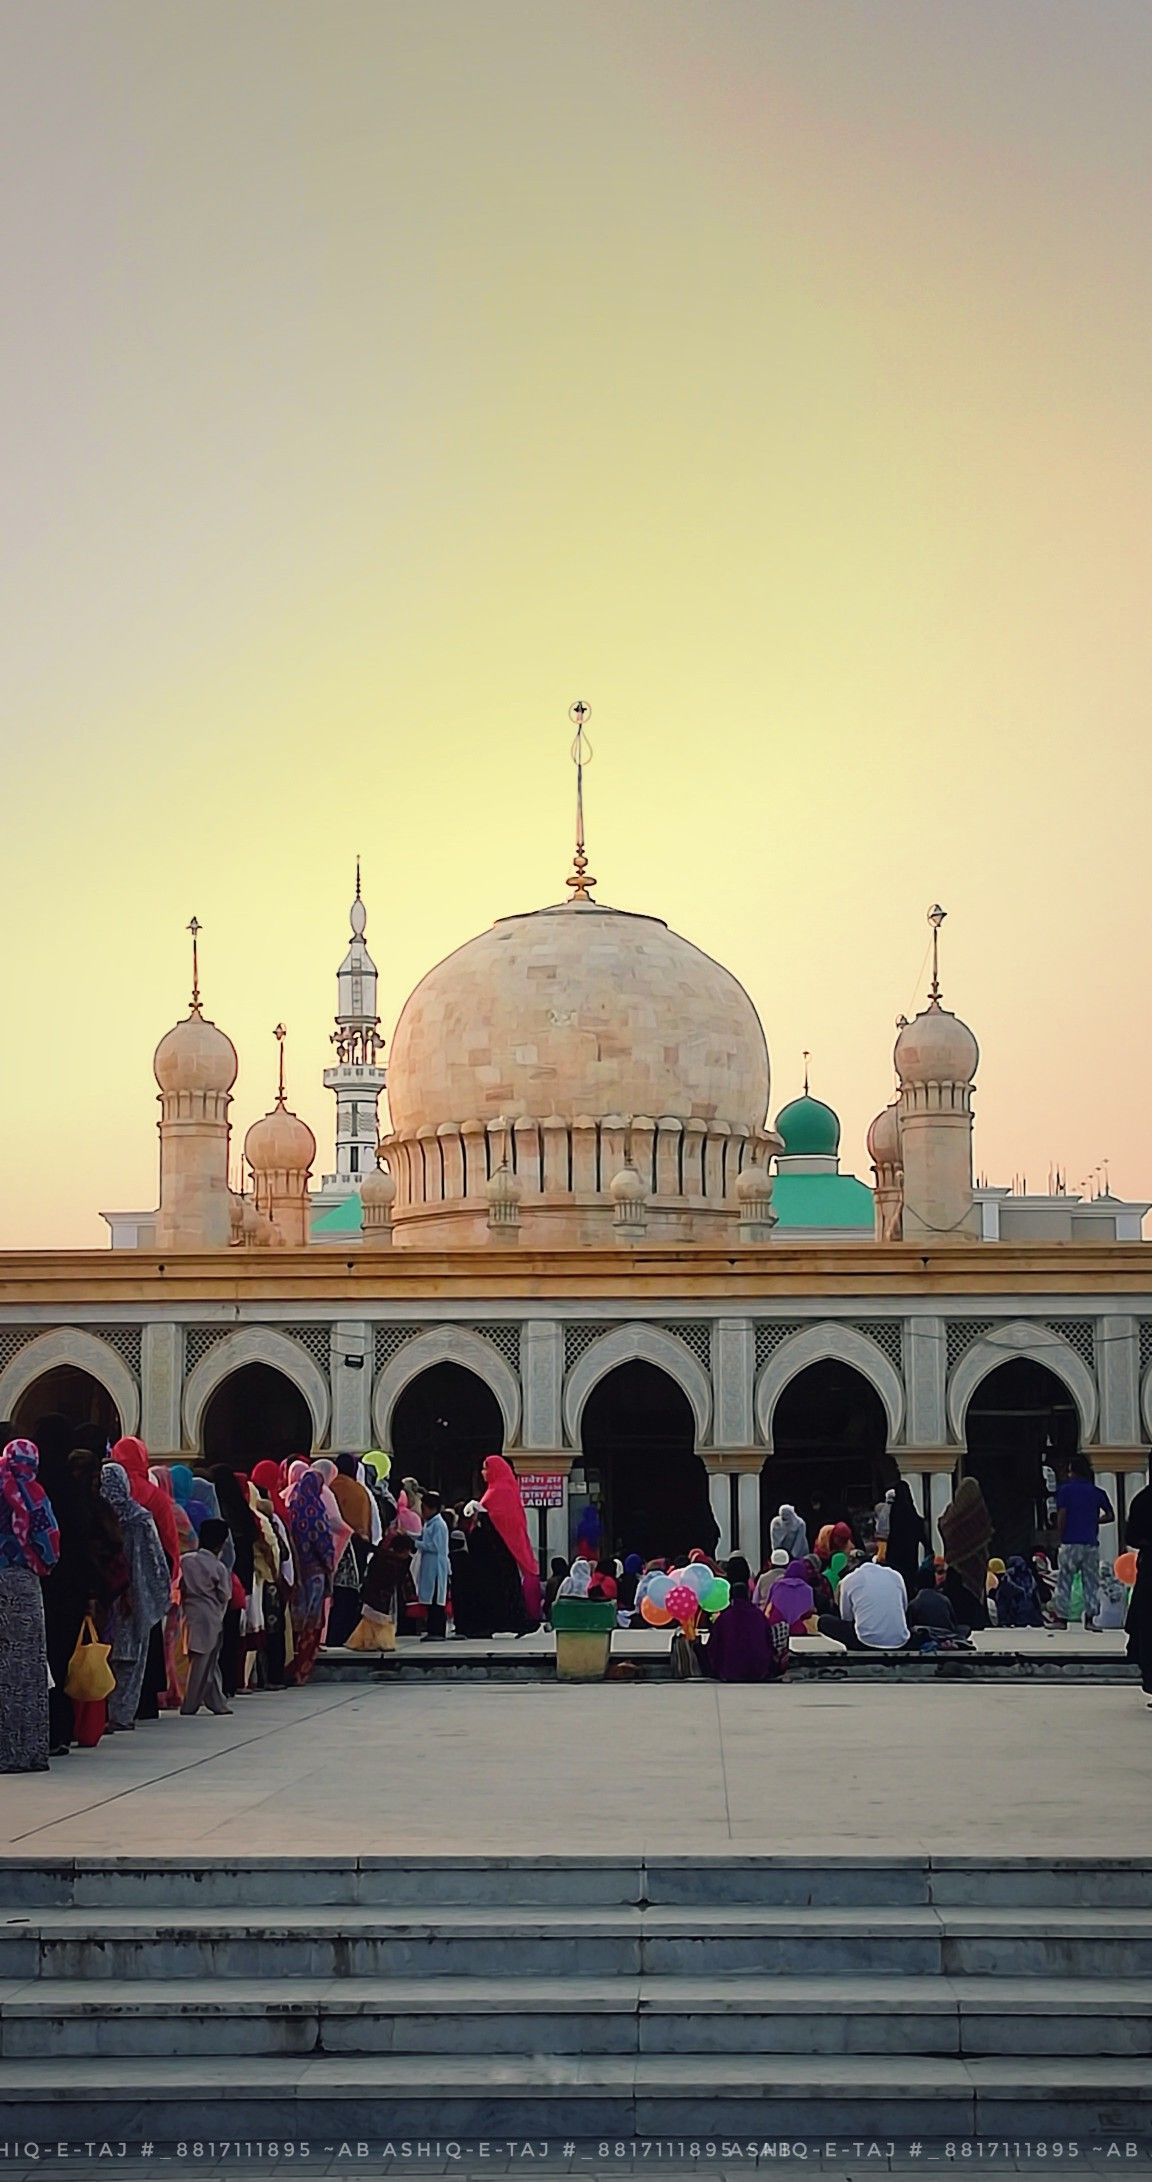 Pin by Abid ali on Baba Tajuddin Nagpur | Islamic pictures